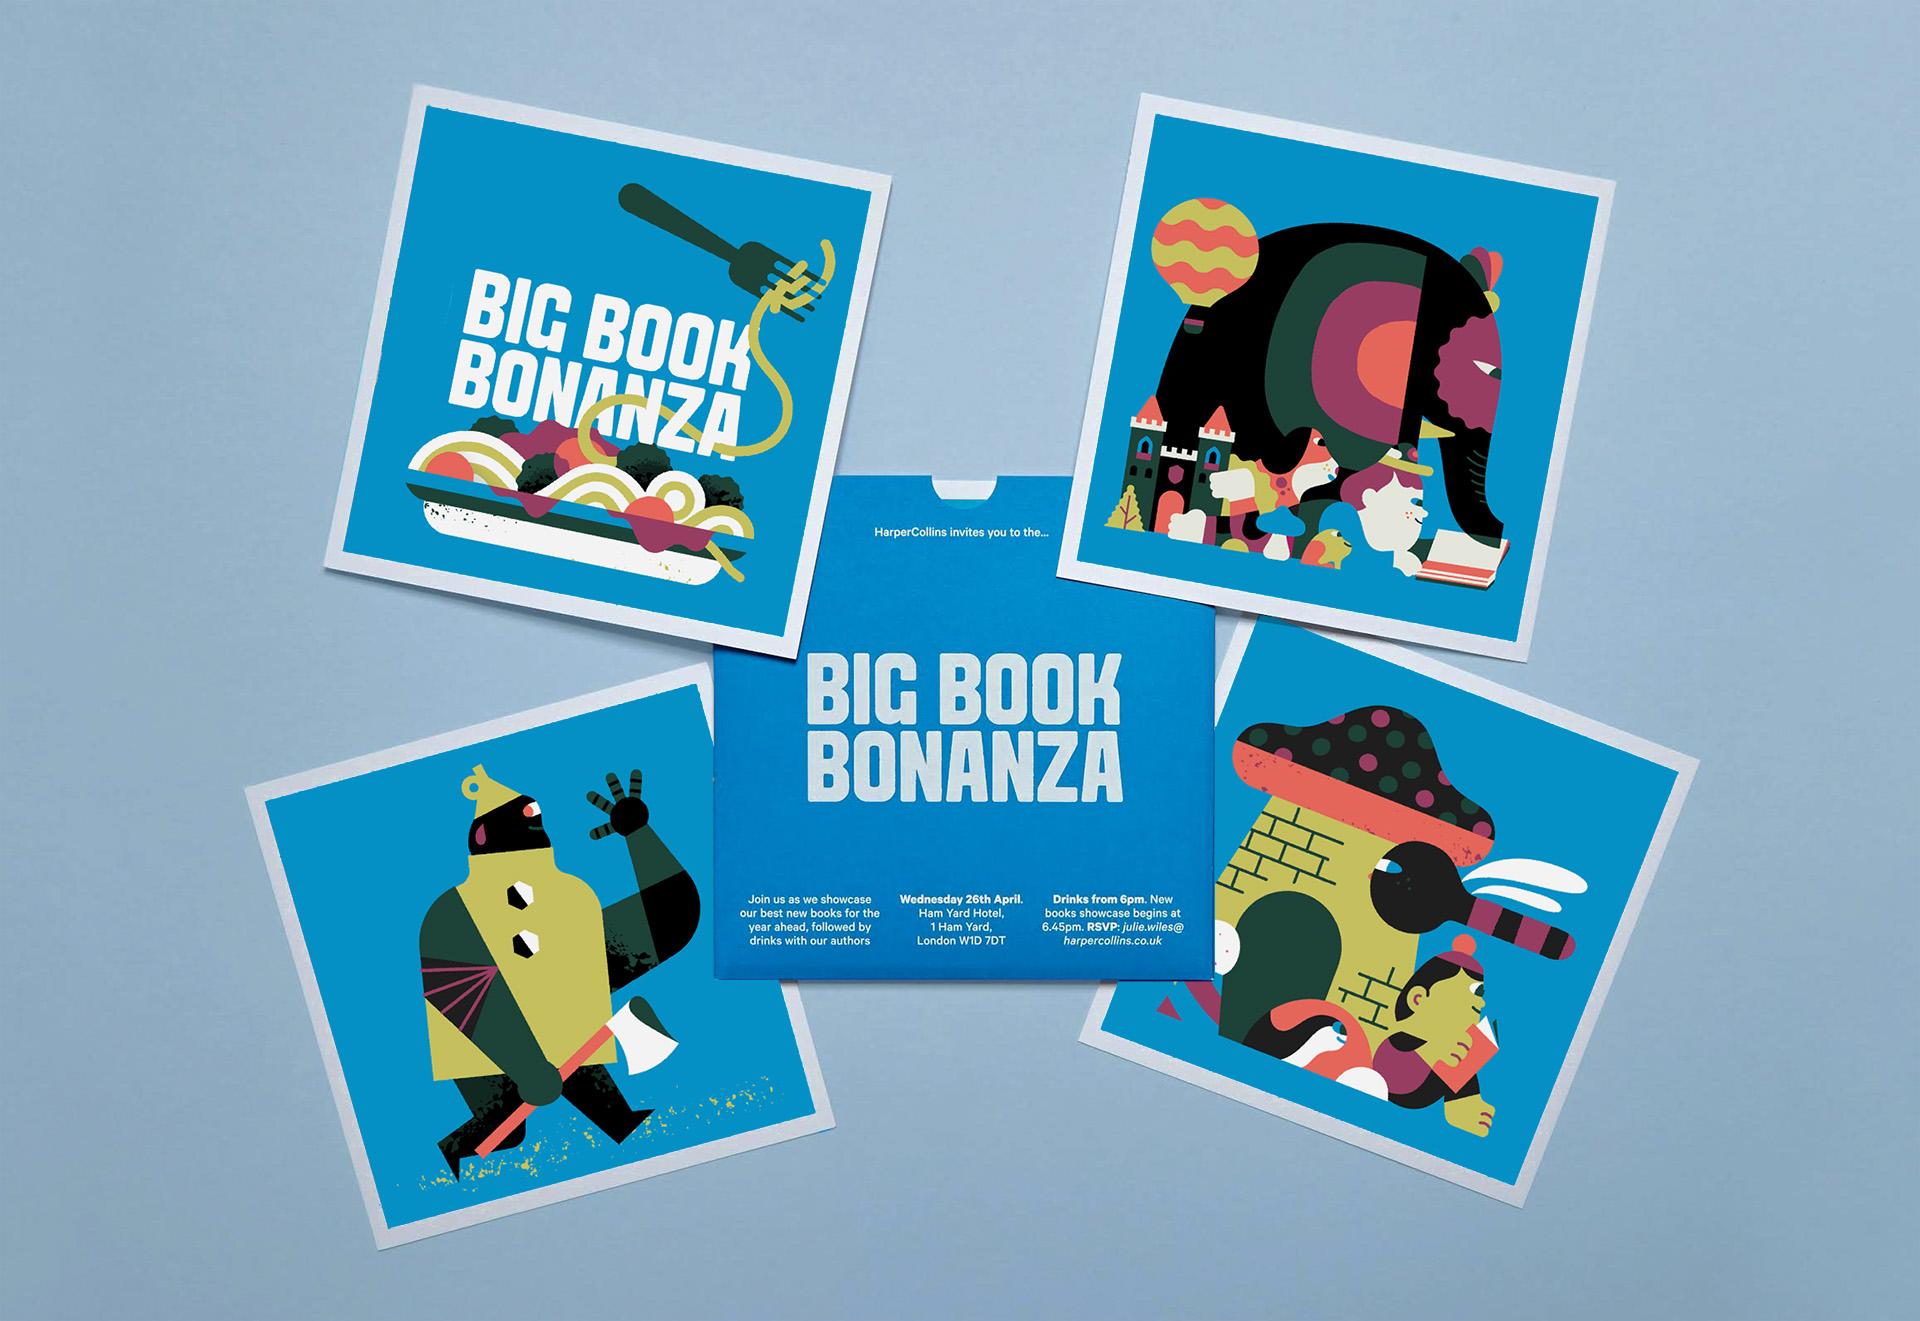 Hedof_Big Book Bonanza_cards.jpg